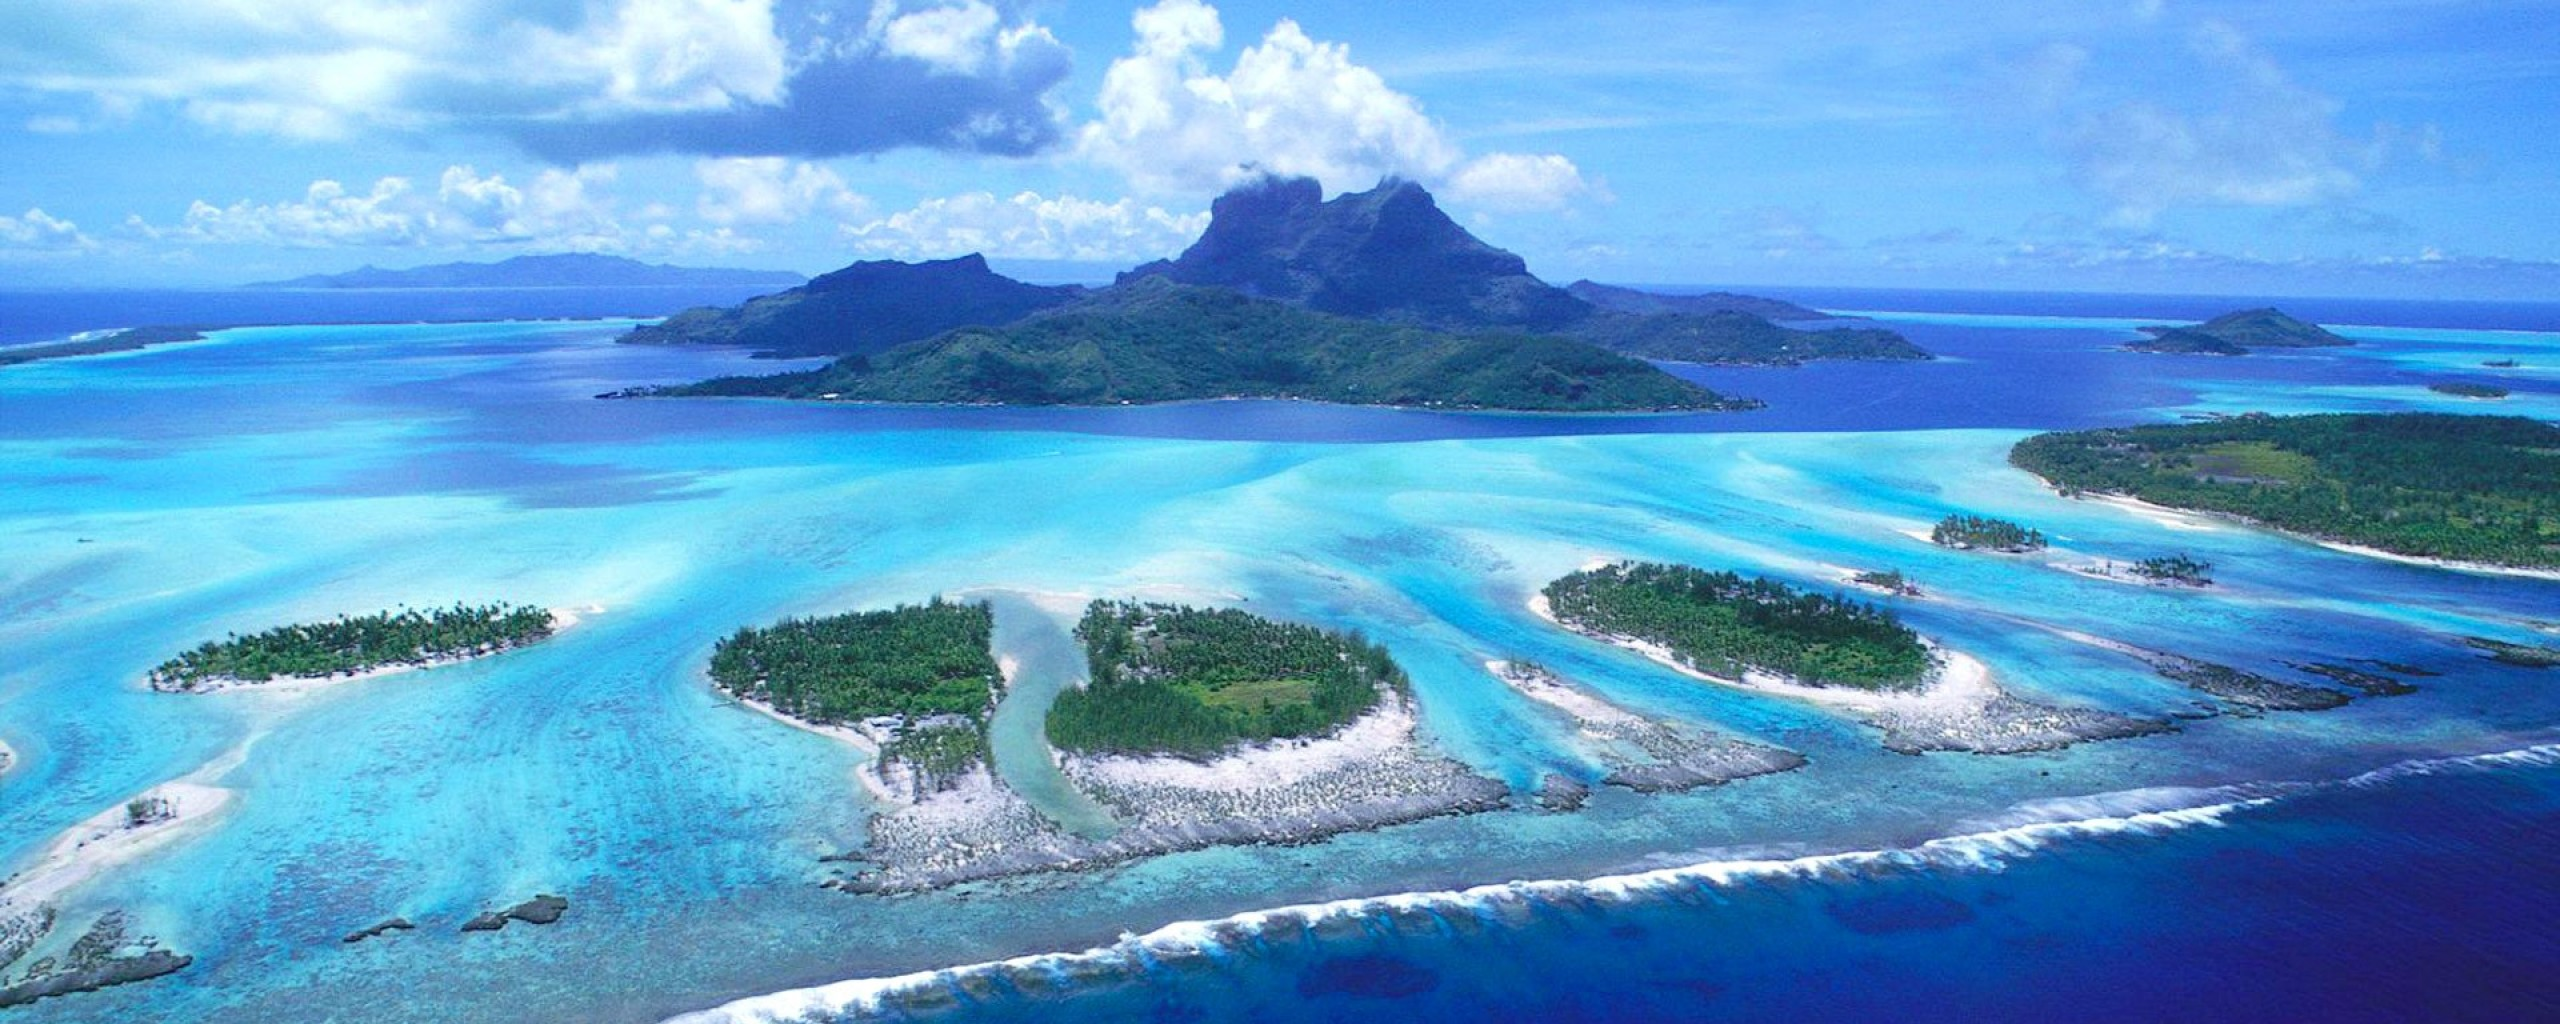 ... : http://www.desktopas.com/tropical-desktop-backgrounds-25601024.html